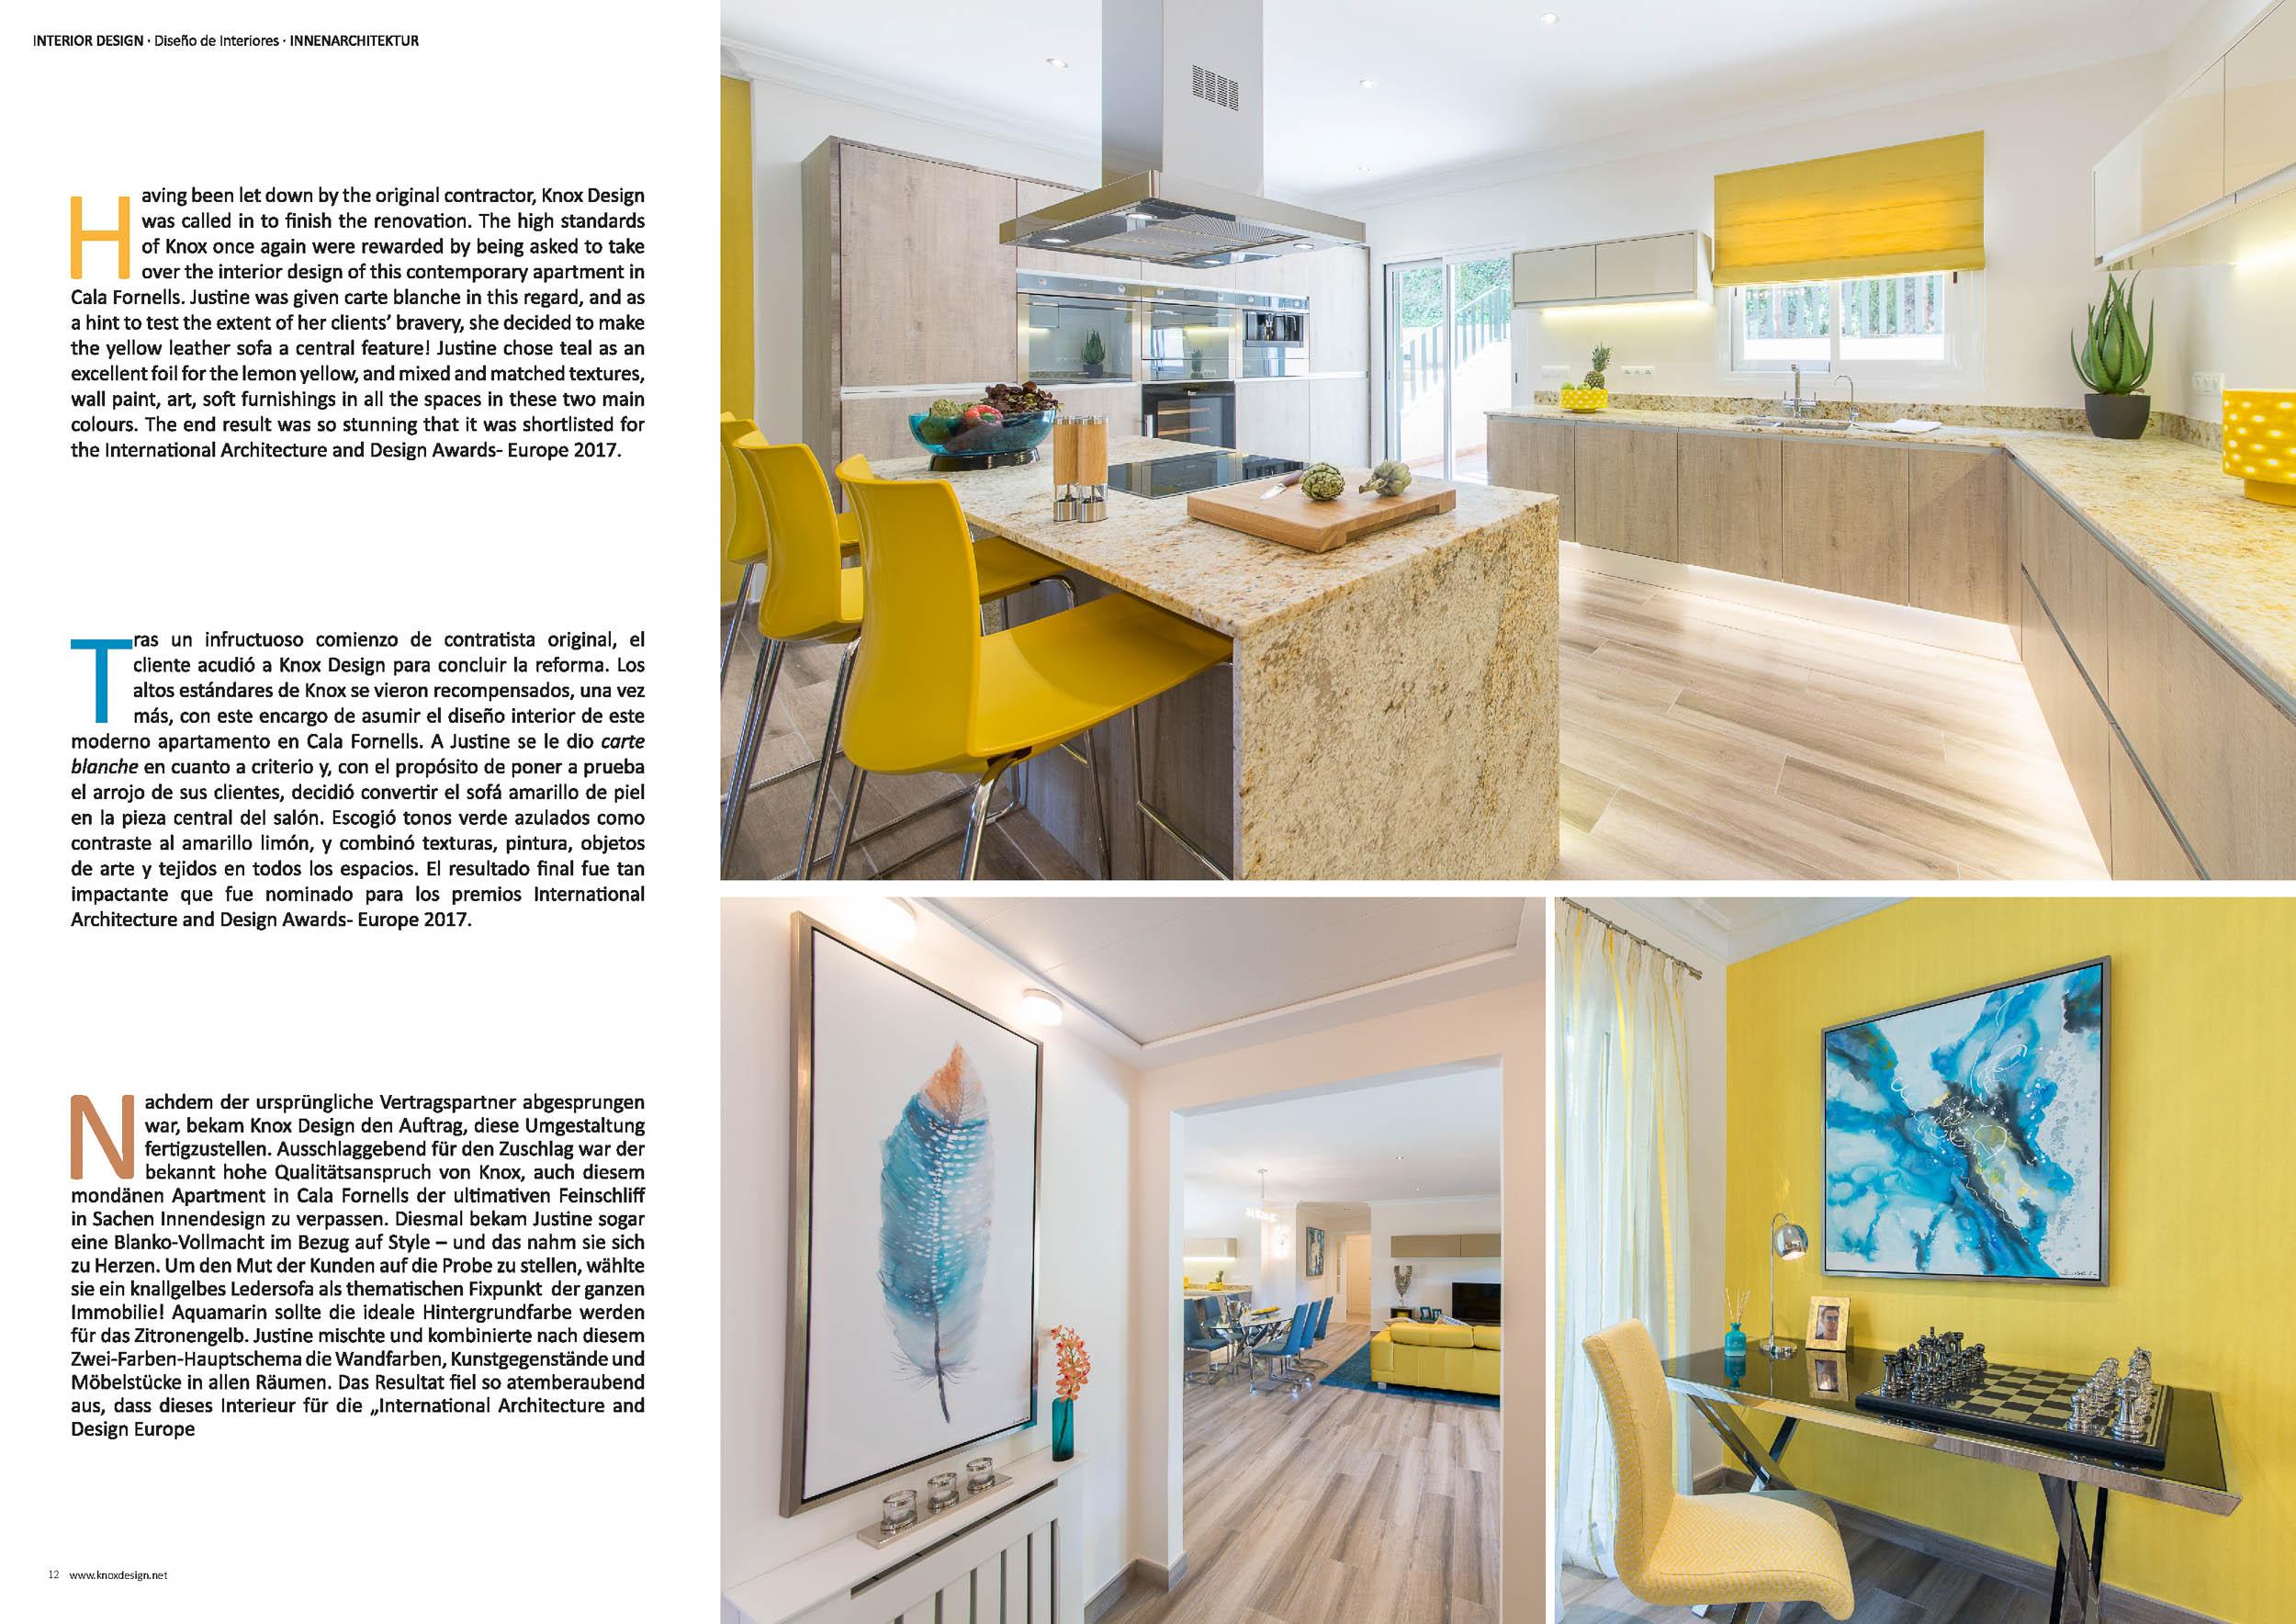 KNOX Design 3-4.jpg